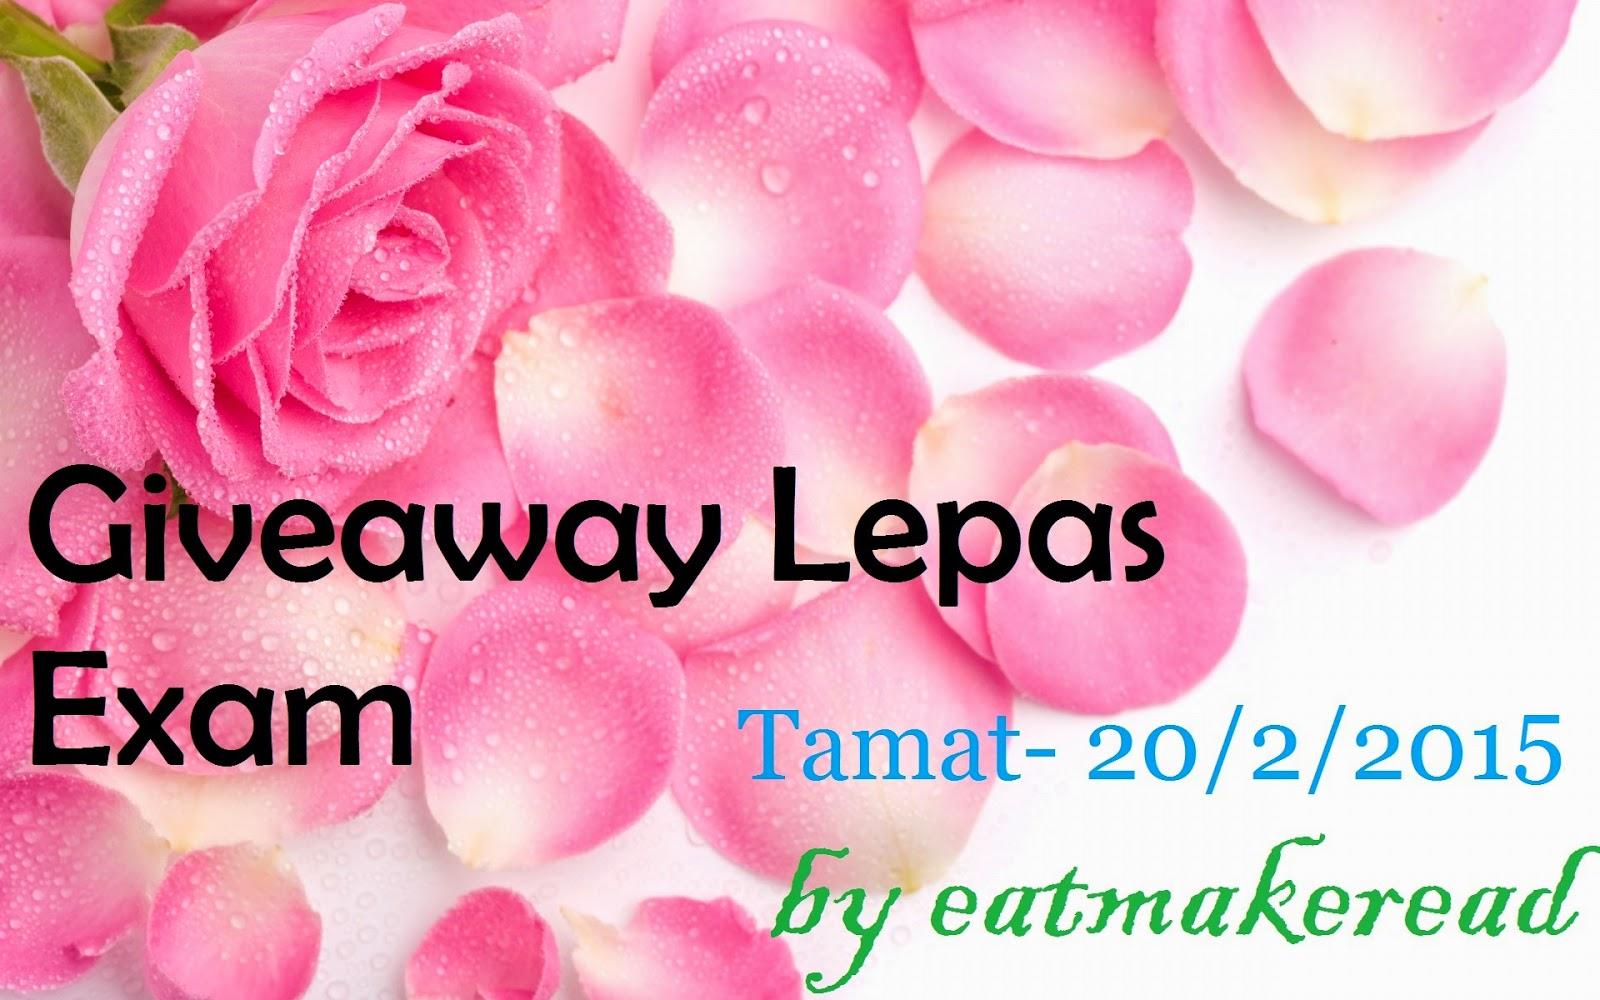 http://eatmakeread.blogspot.com/2015/01/giveaway-lepas-exam.html